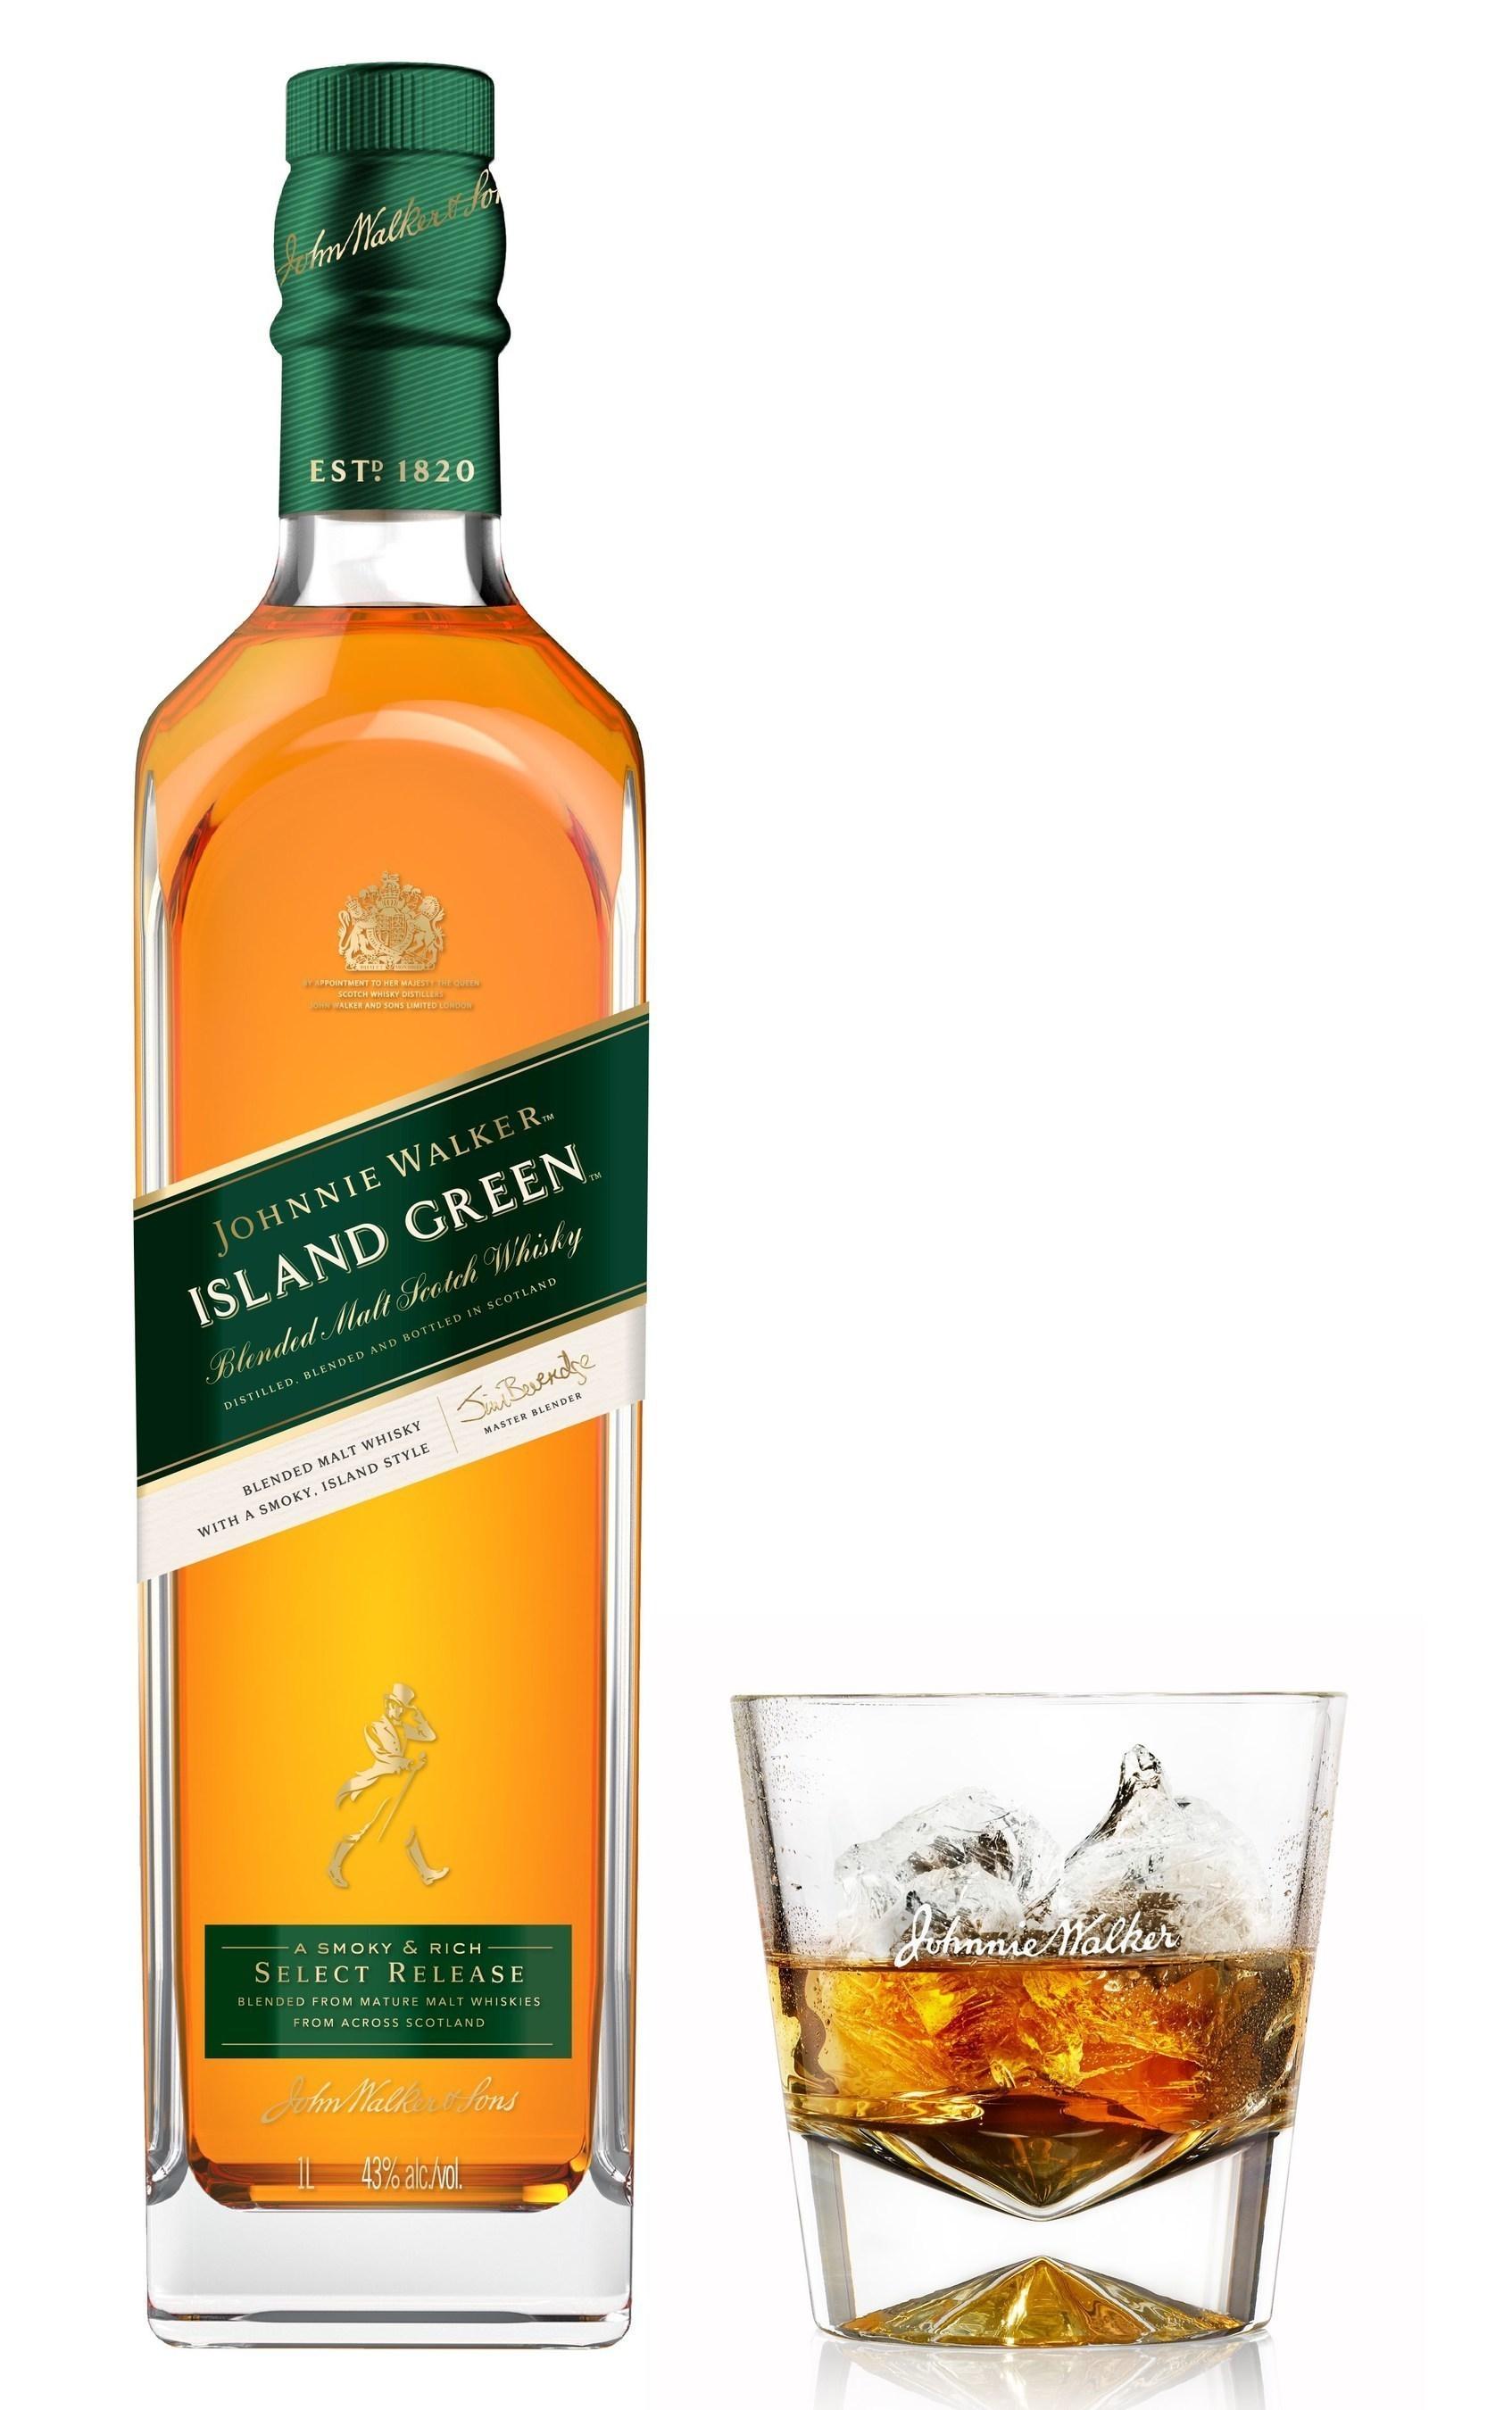 Johnnie Walker Island Green Bottle and Glass (PRNewsFoto/Diageo GTME)